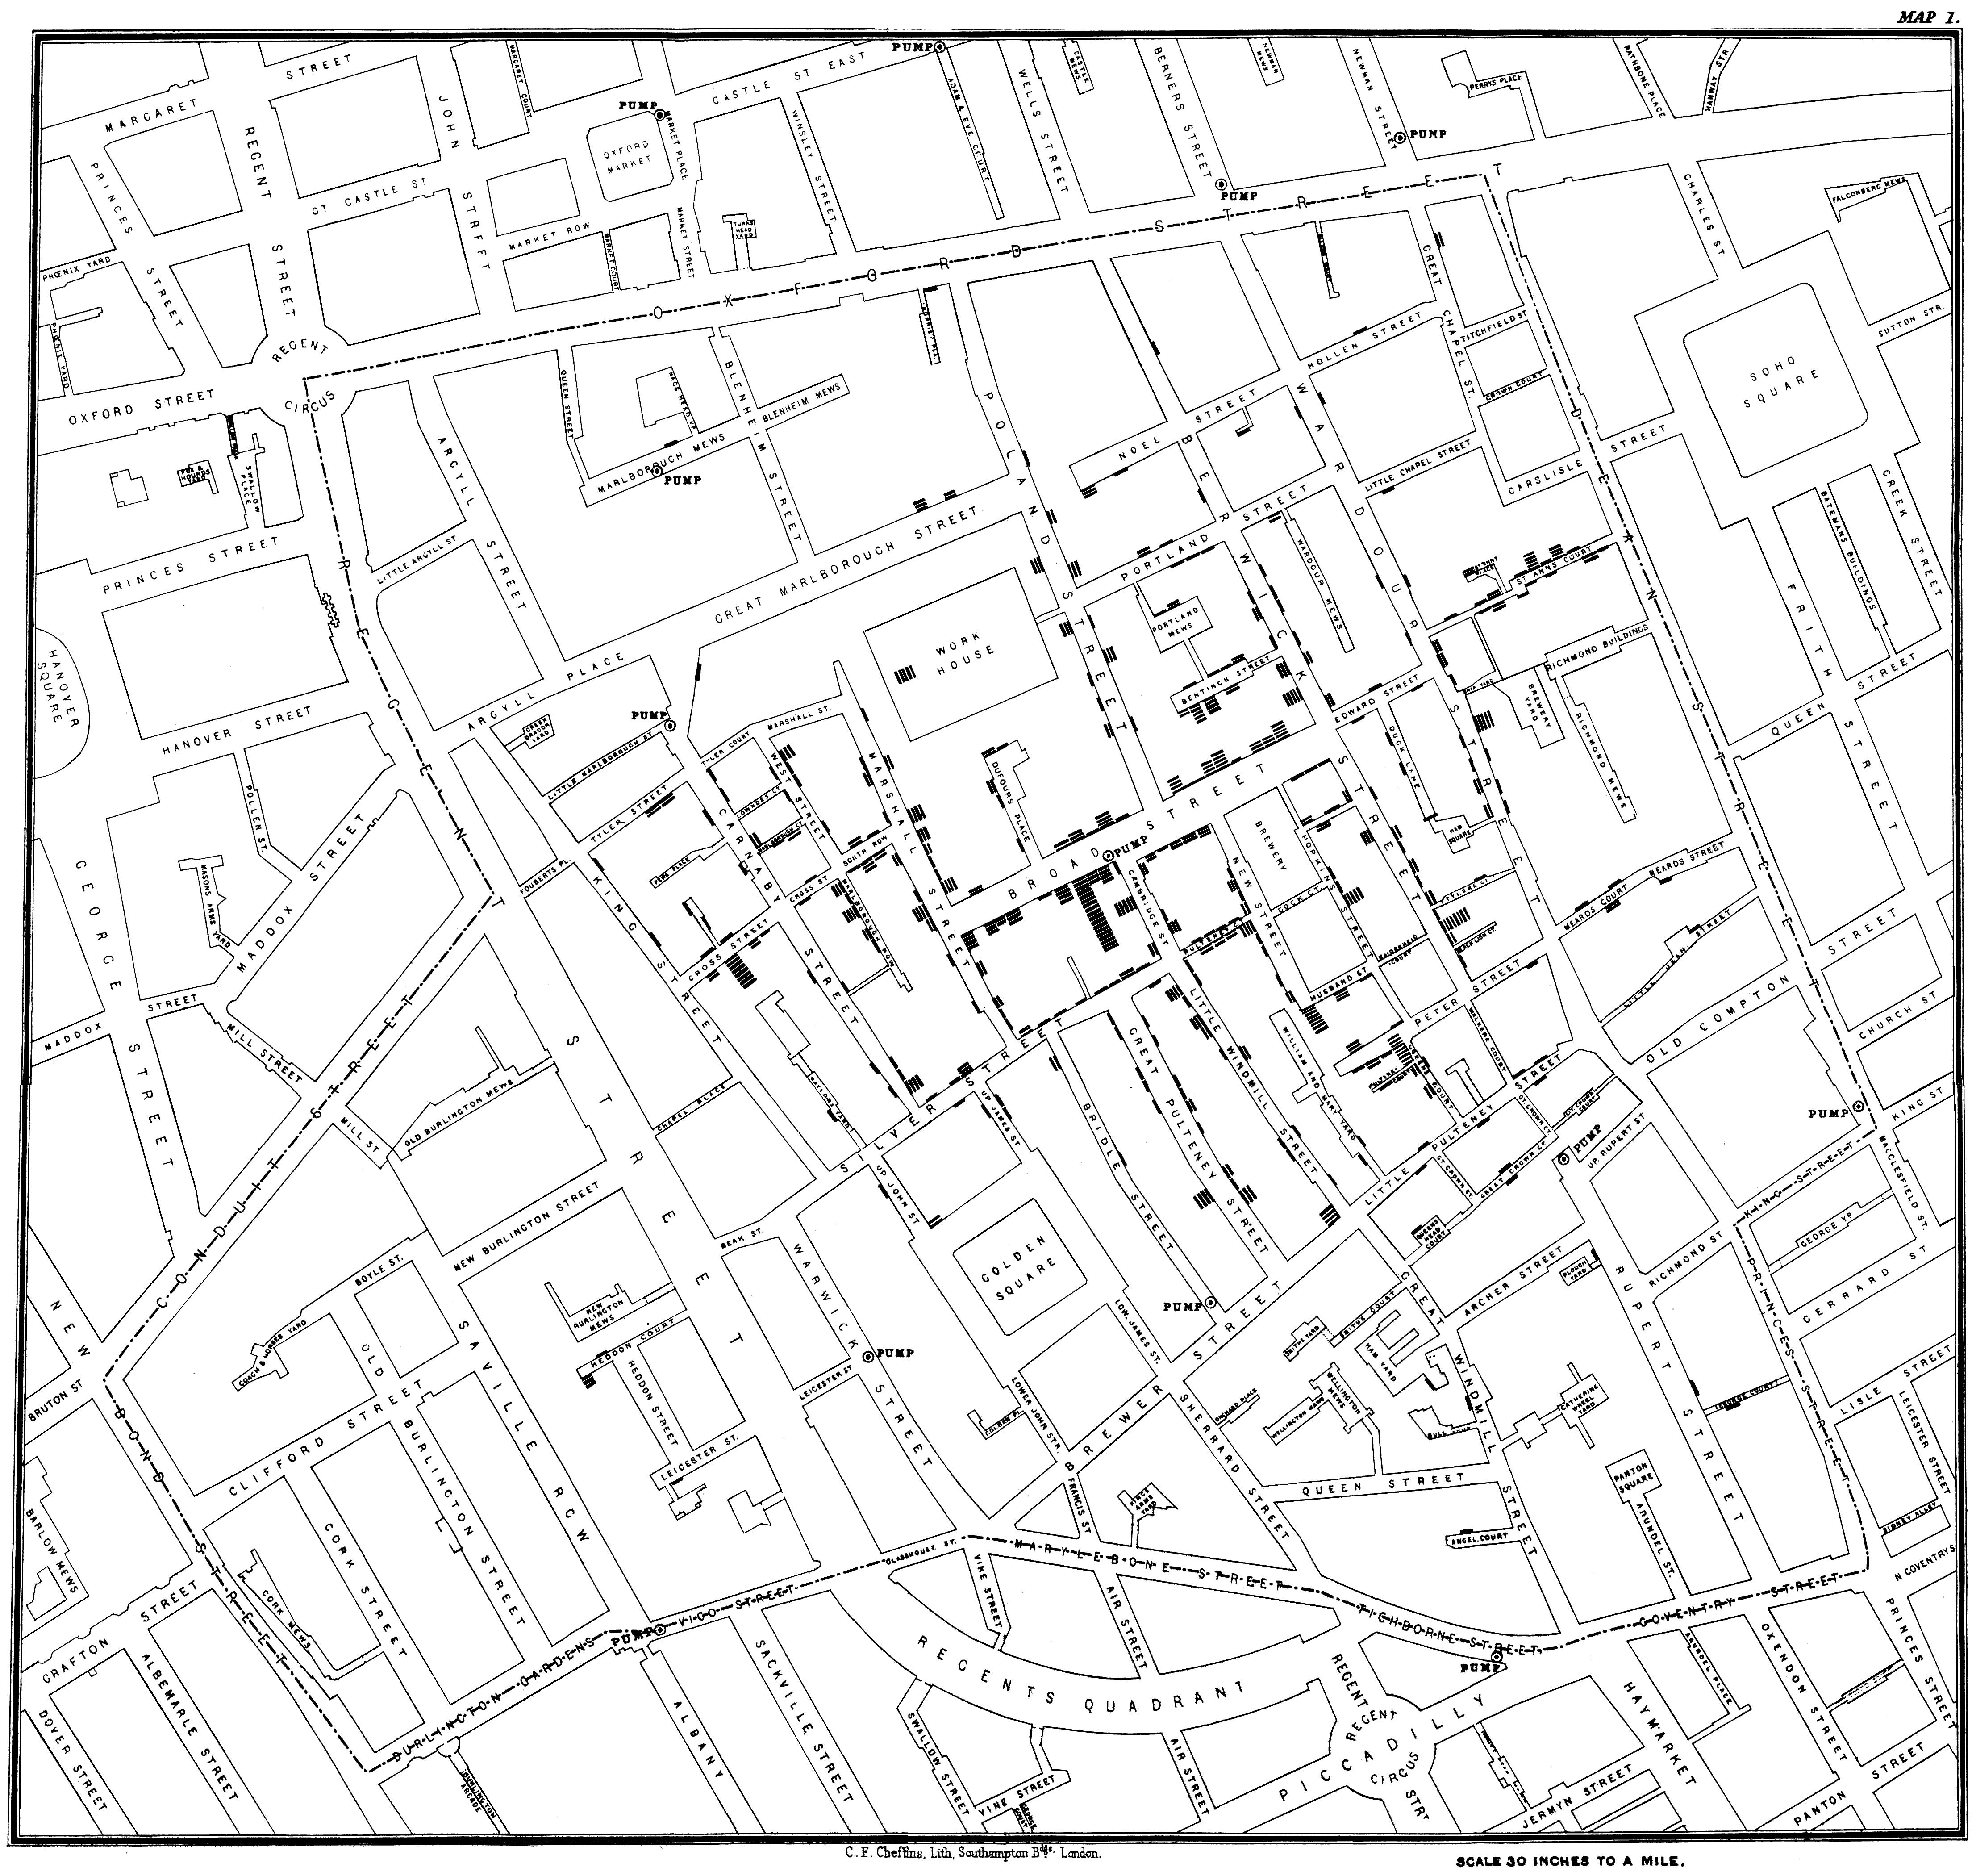 4417x4201 Dr. John Snow's Map Of The 1854 London Cholera Outbreak Data